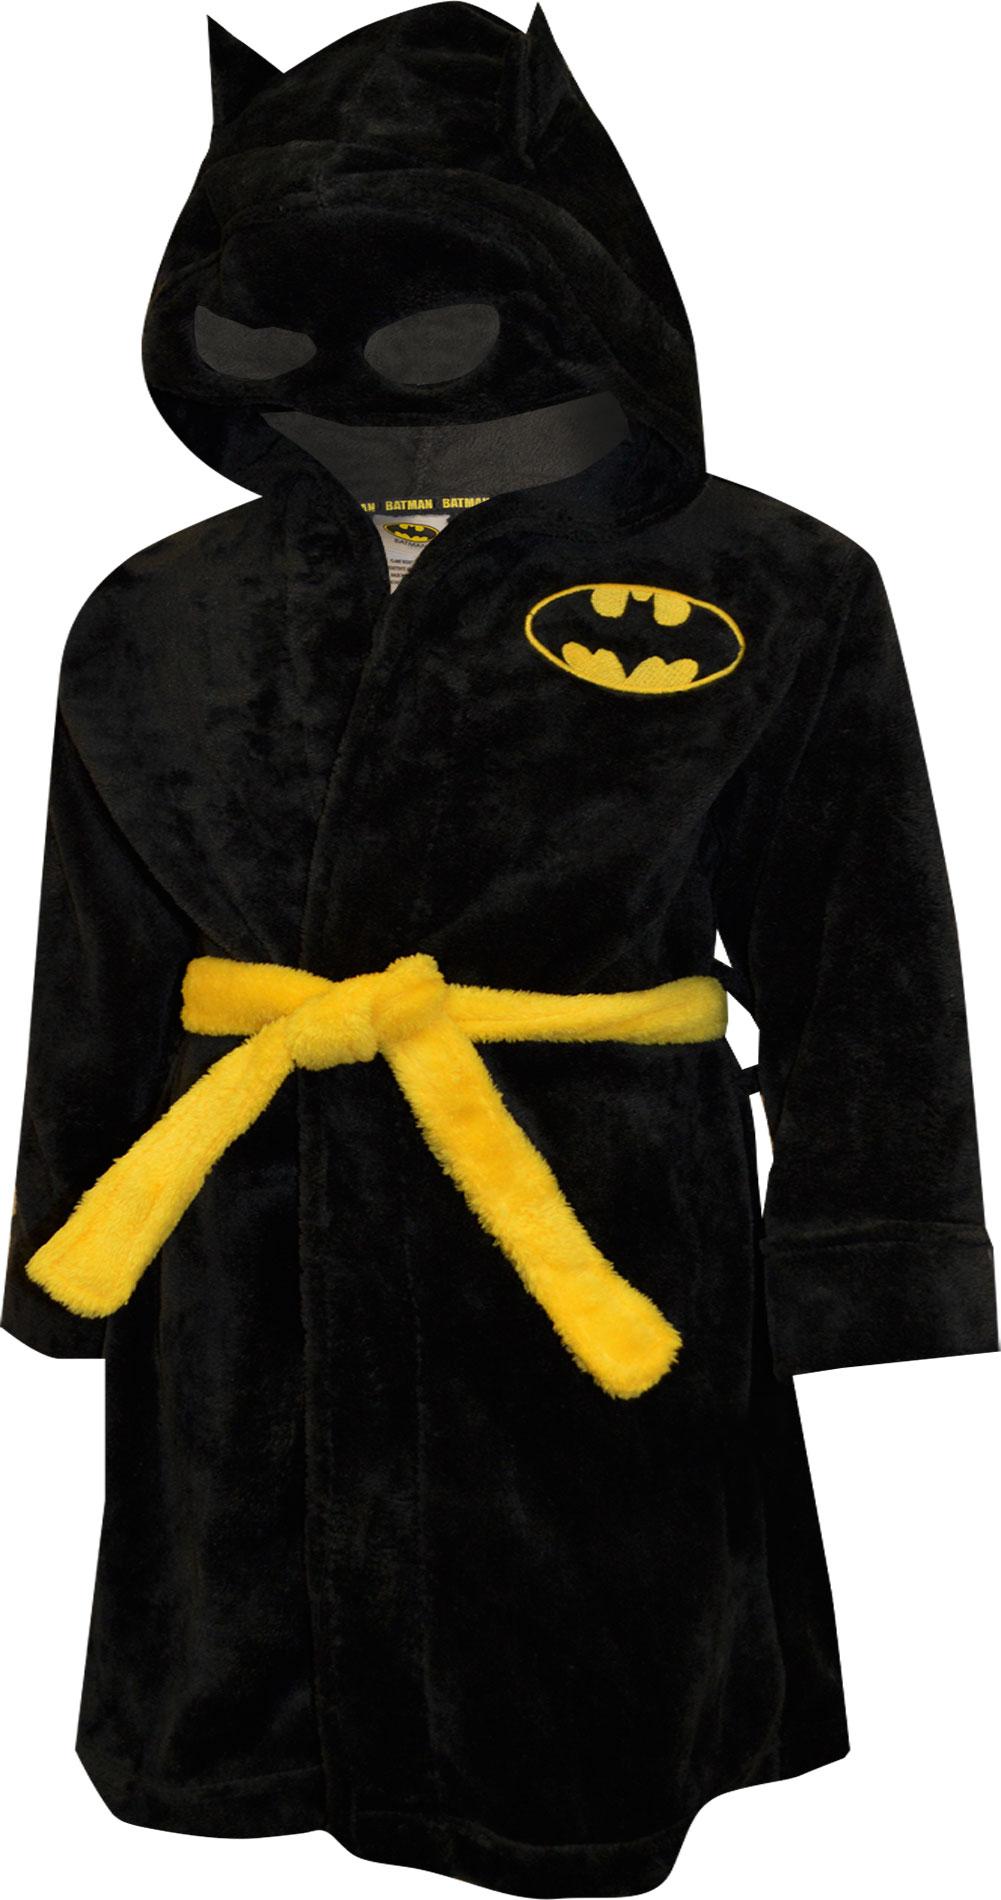 Image of DC Comics Batman Logo Plush Robe for boys